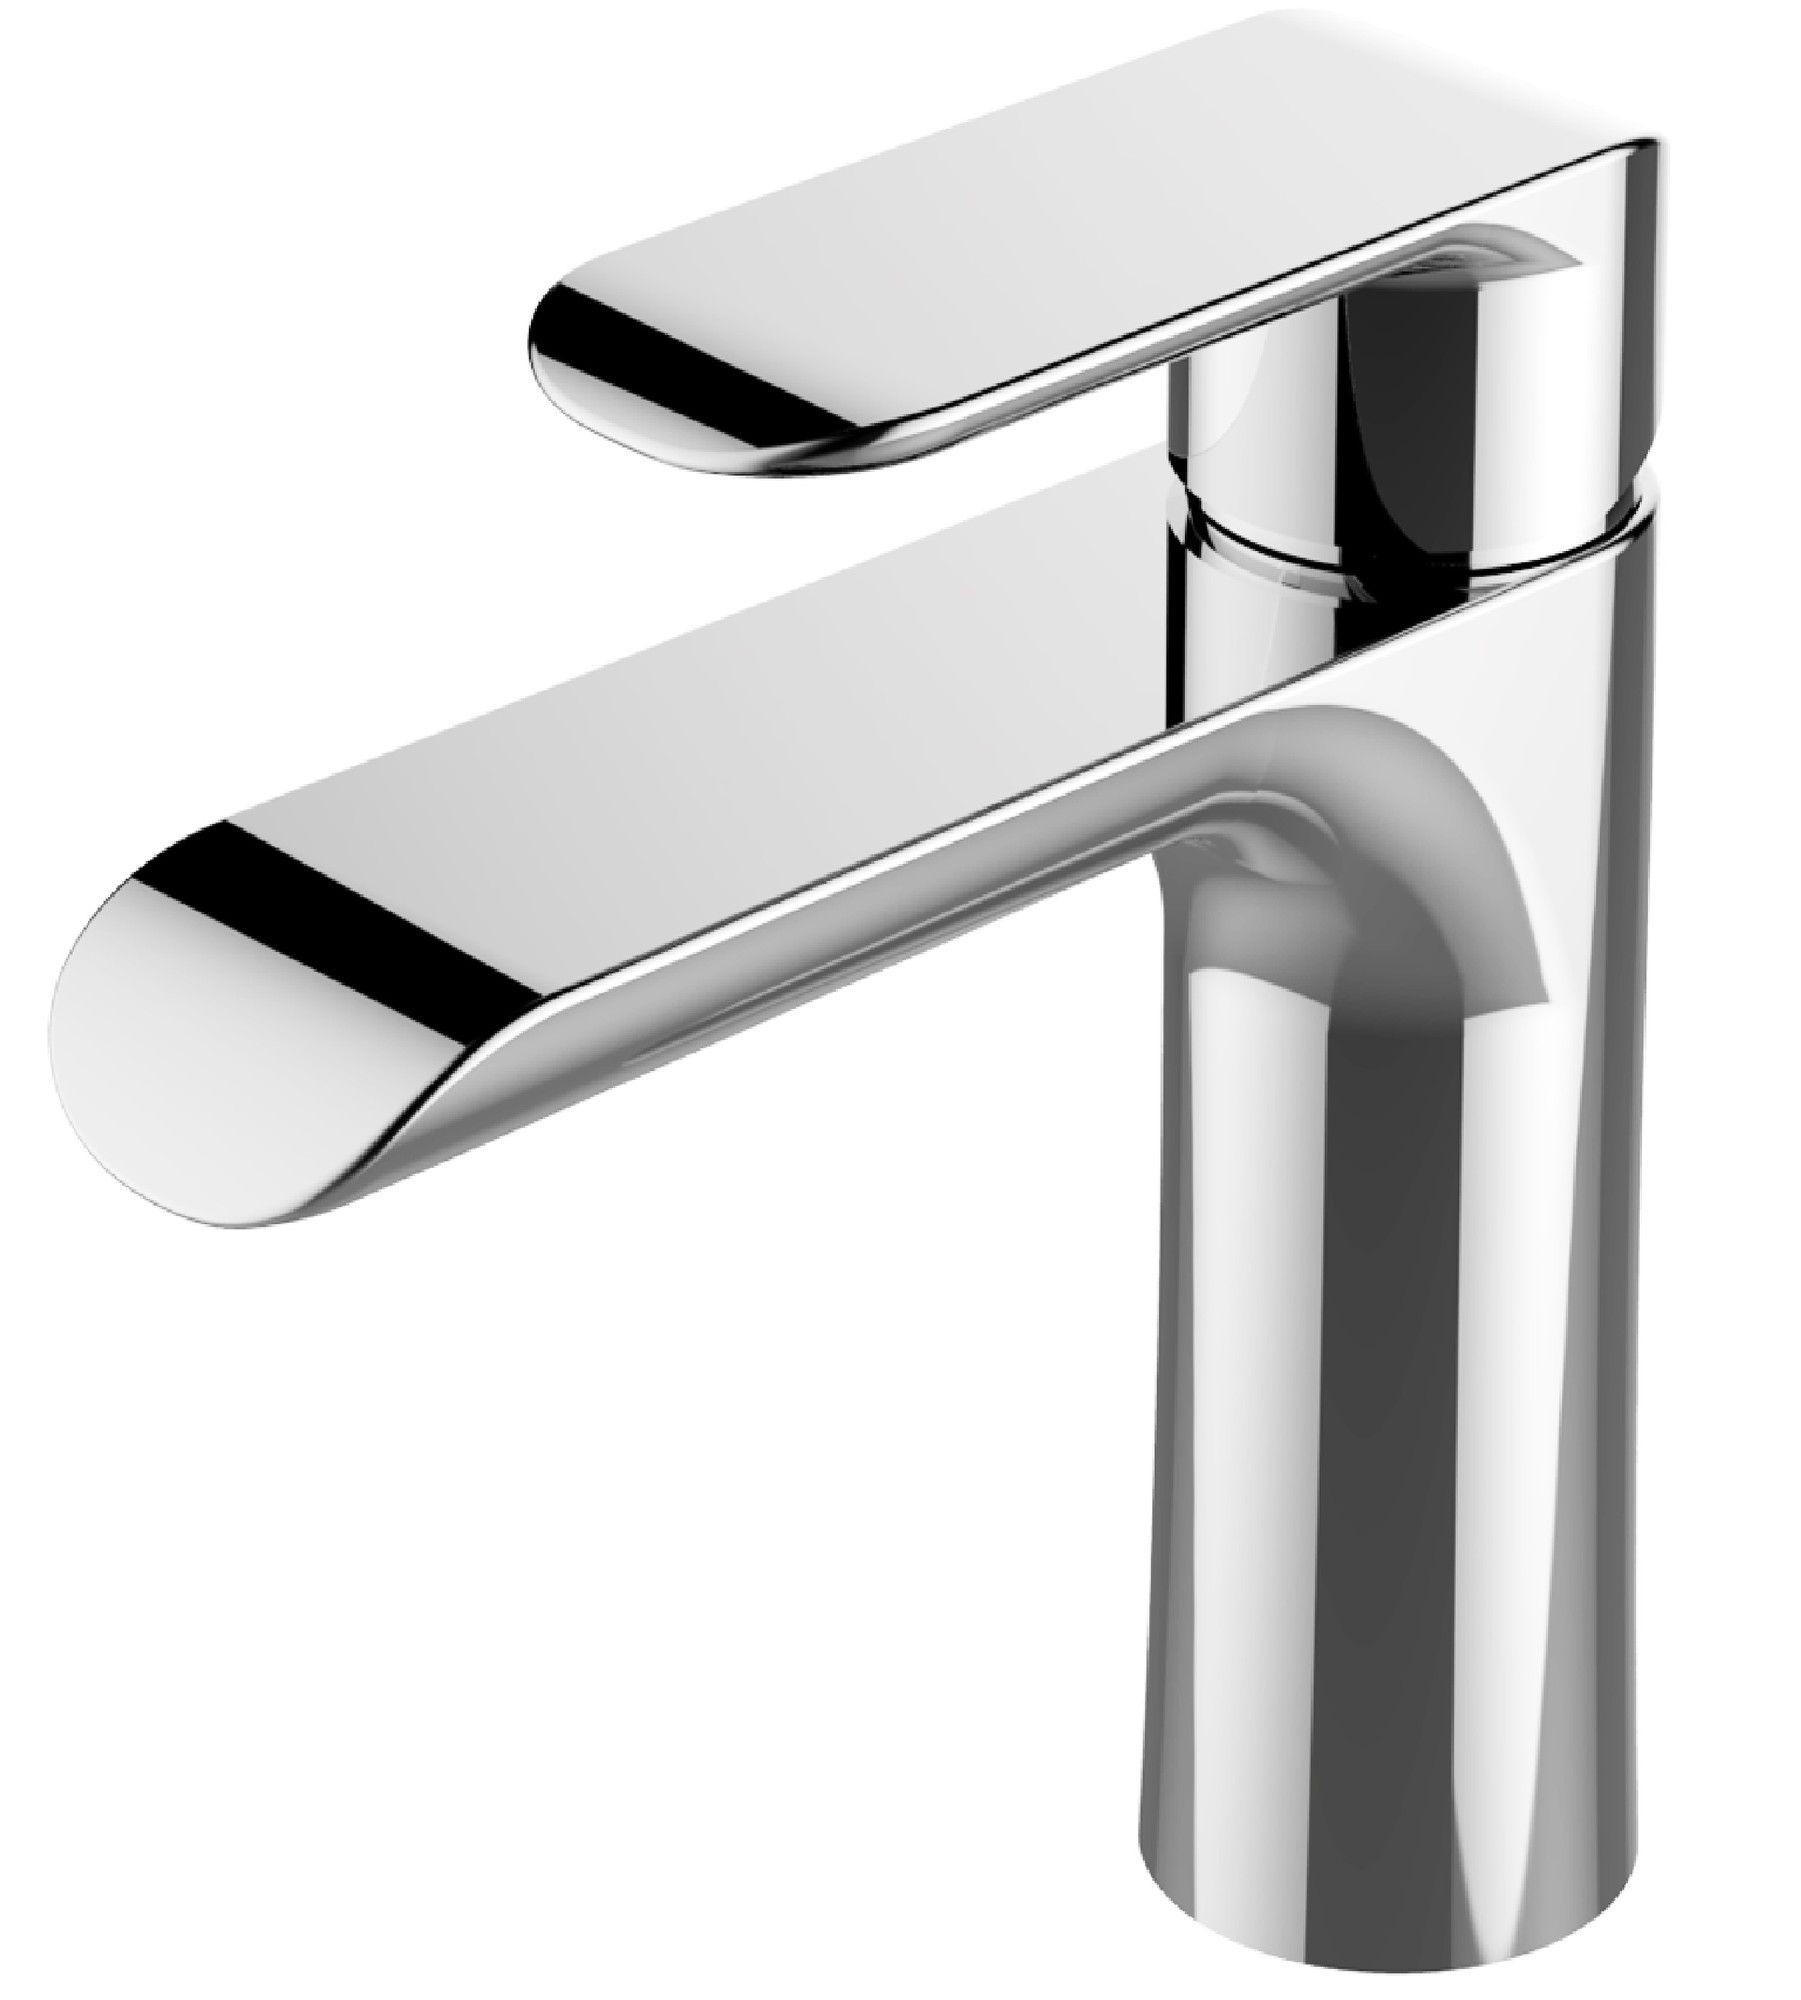 Yolanda Series Bathroom Faucet Single Handle | Products | Pinterest ...